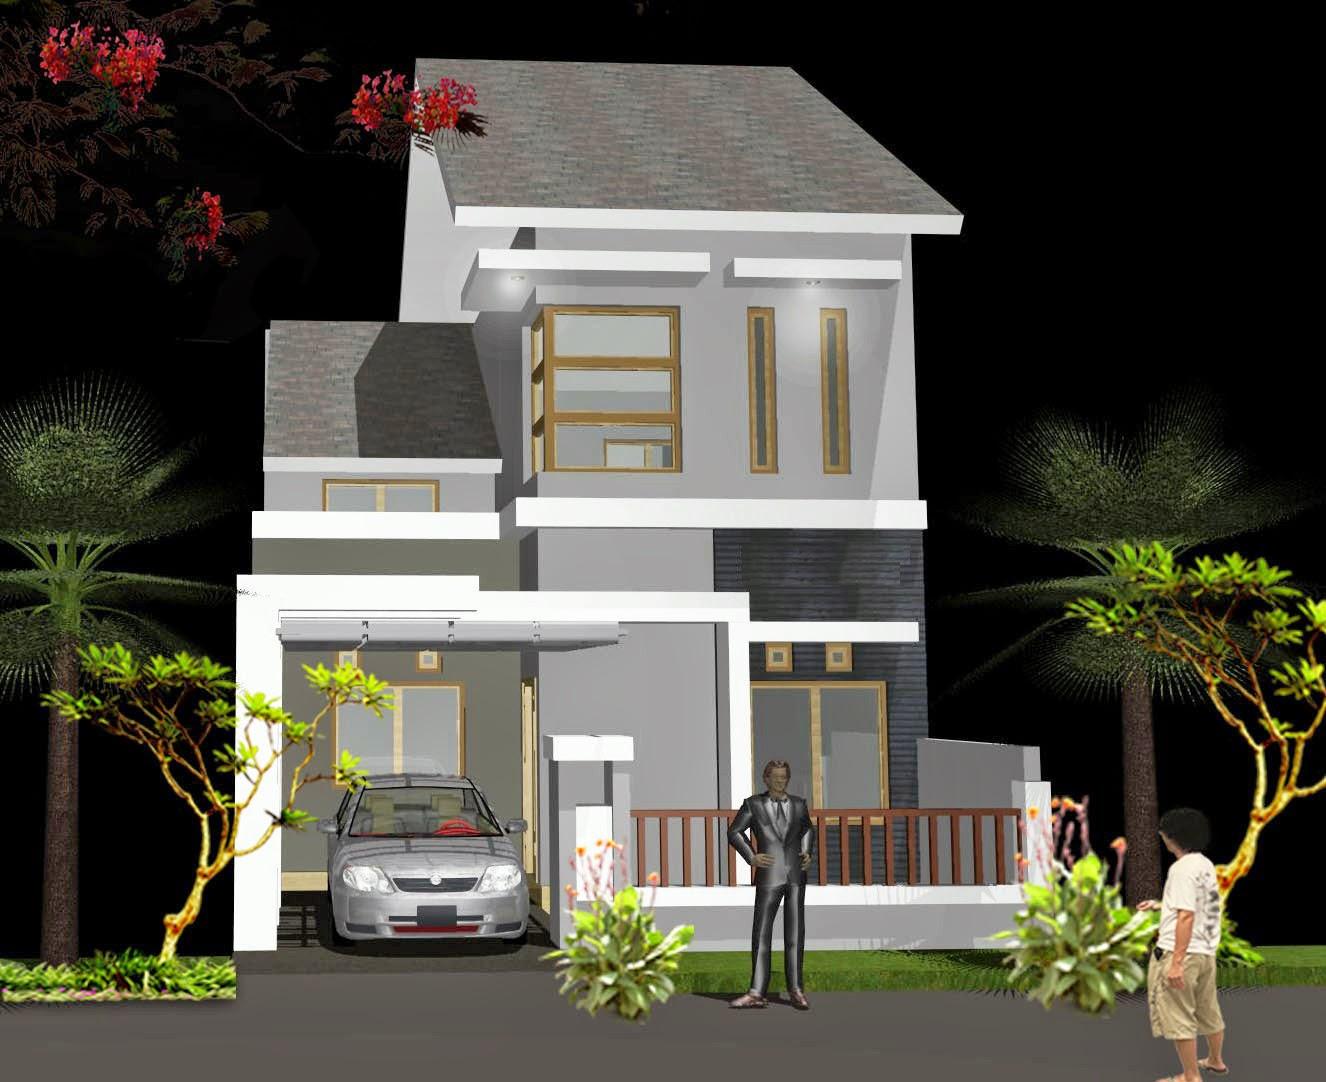 Kumpulan Desain Rumah Minimalis 1 Lantai Elegan dan Modern & Desain Rumah Minimalis 2 Lantai Type 36 Hook | Desain Rumah Minimalis